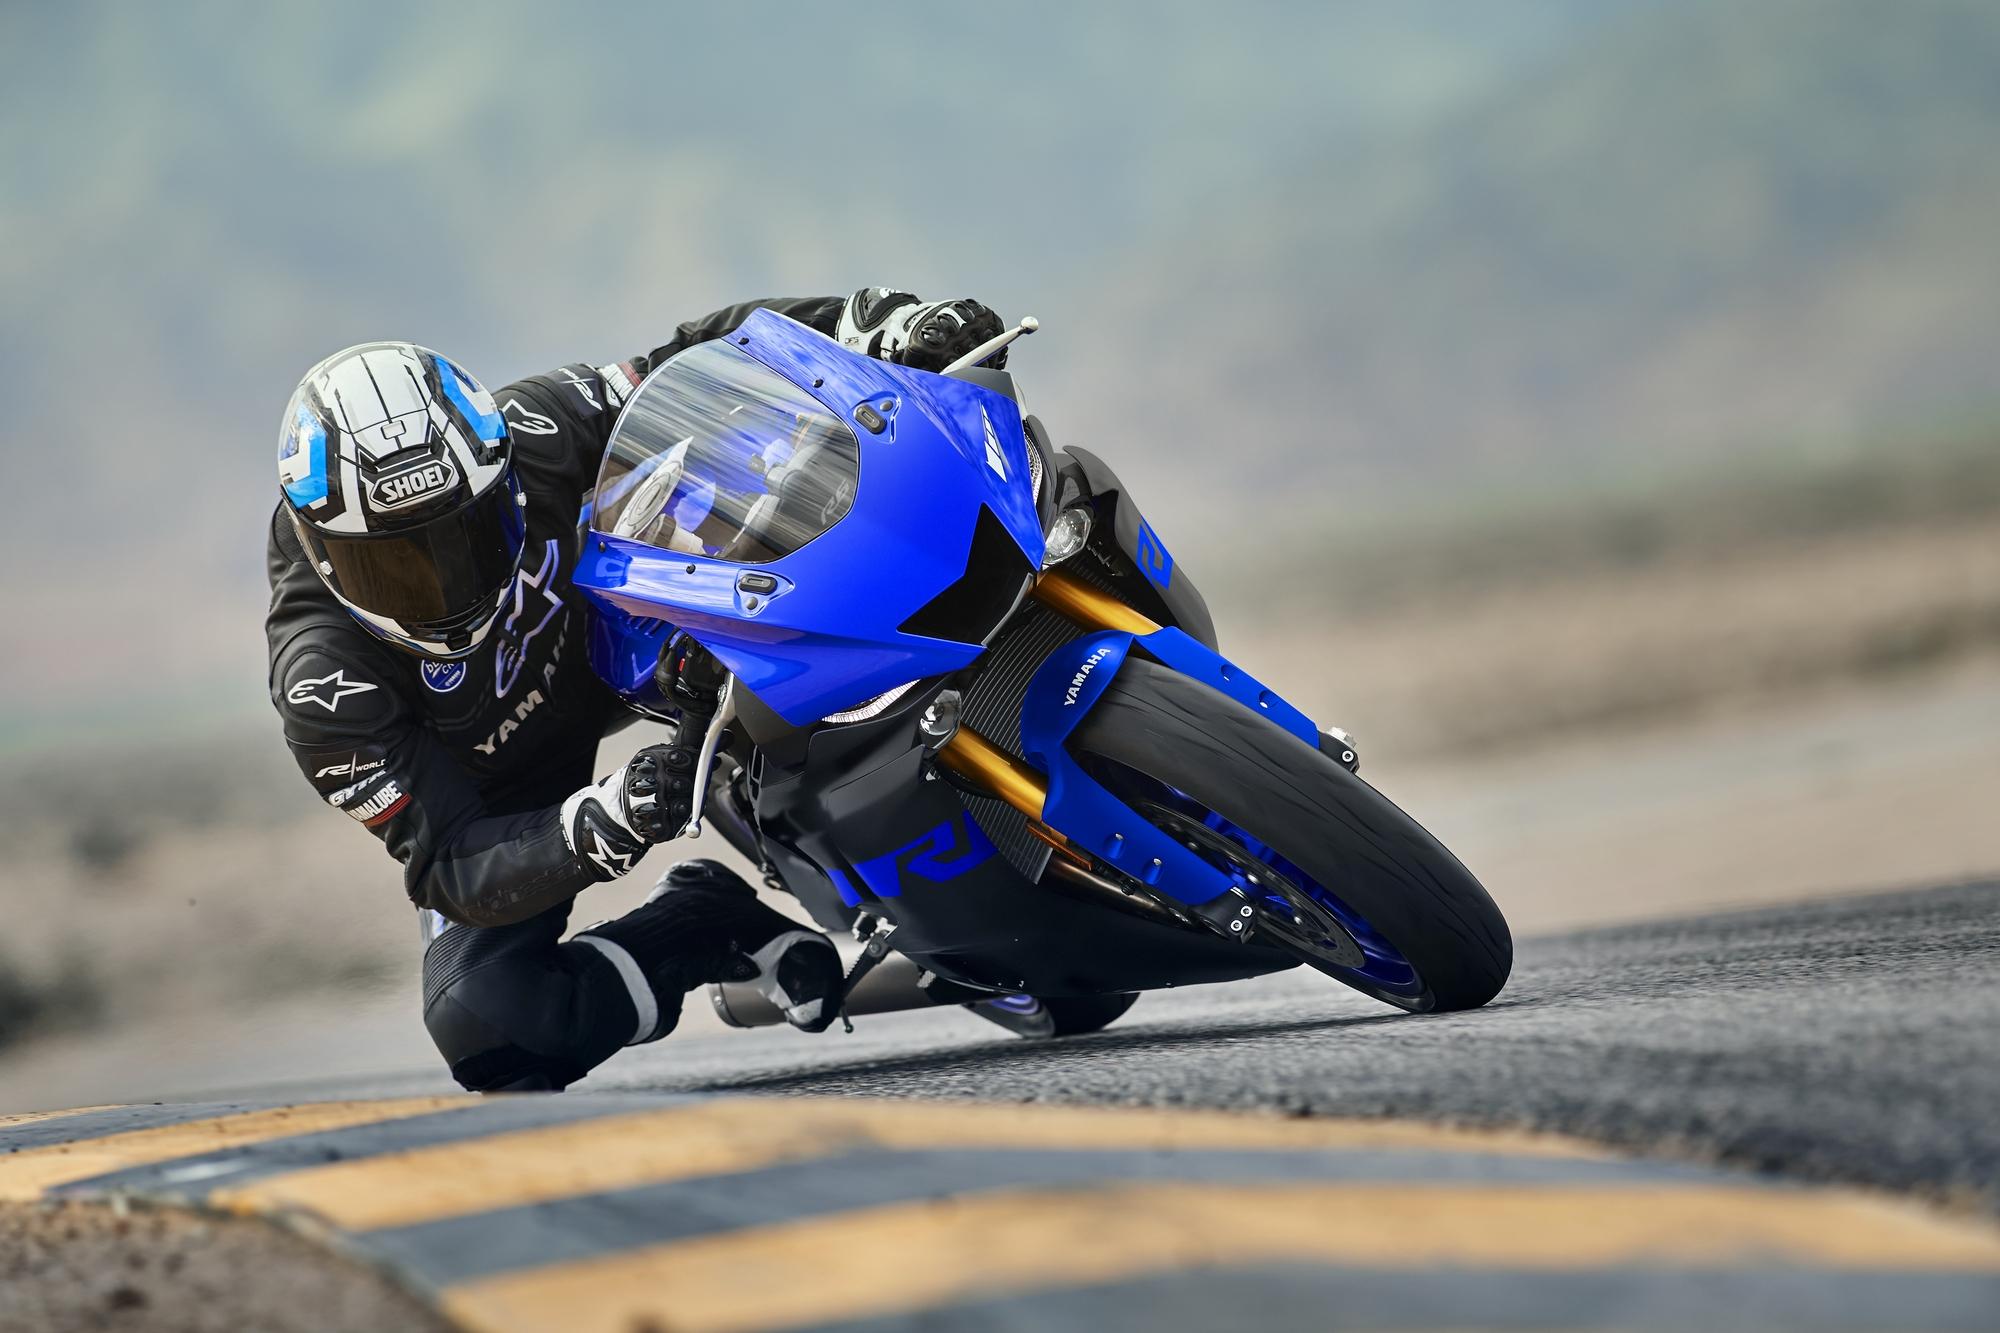 Yzf R6 Motorcycles Yamaha Motor